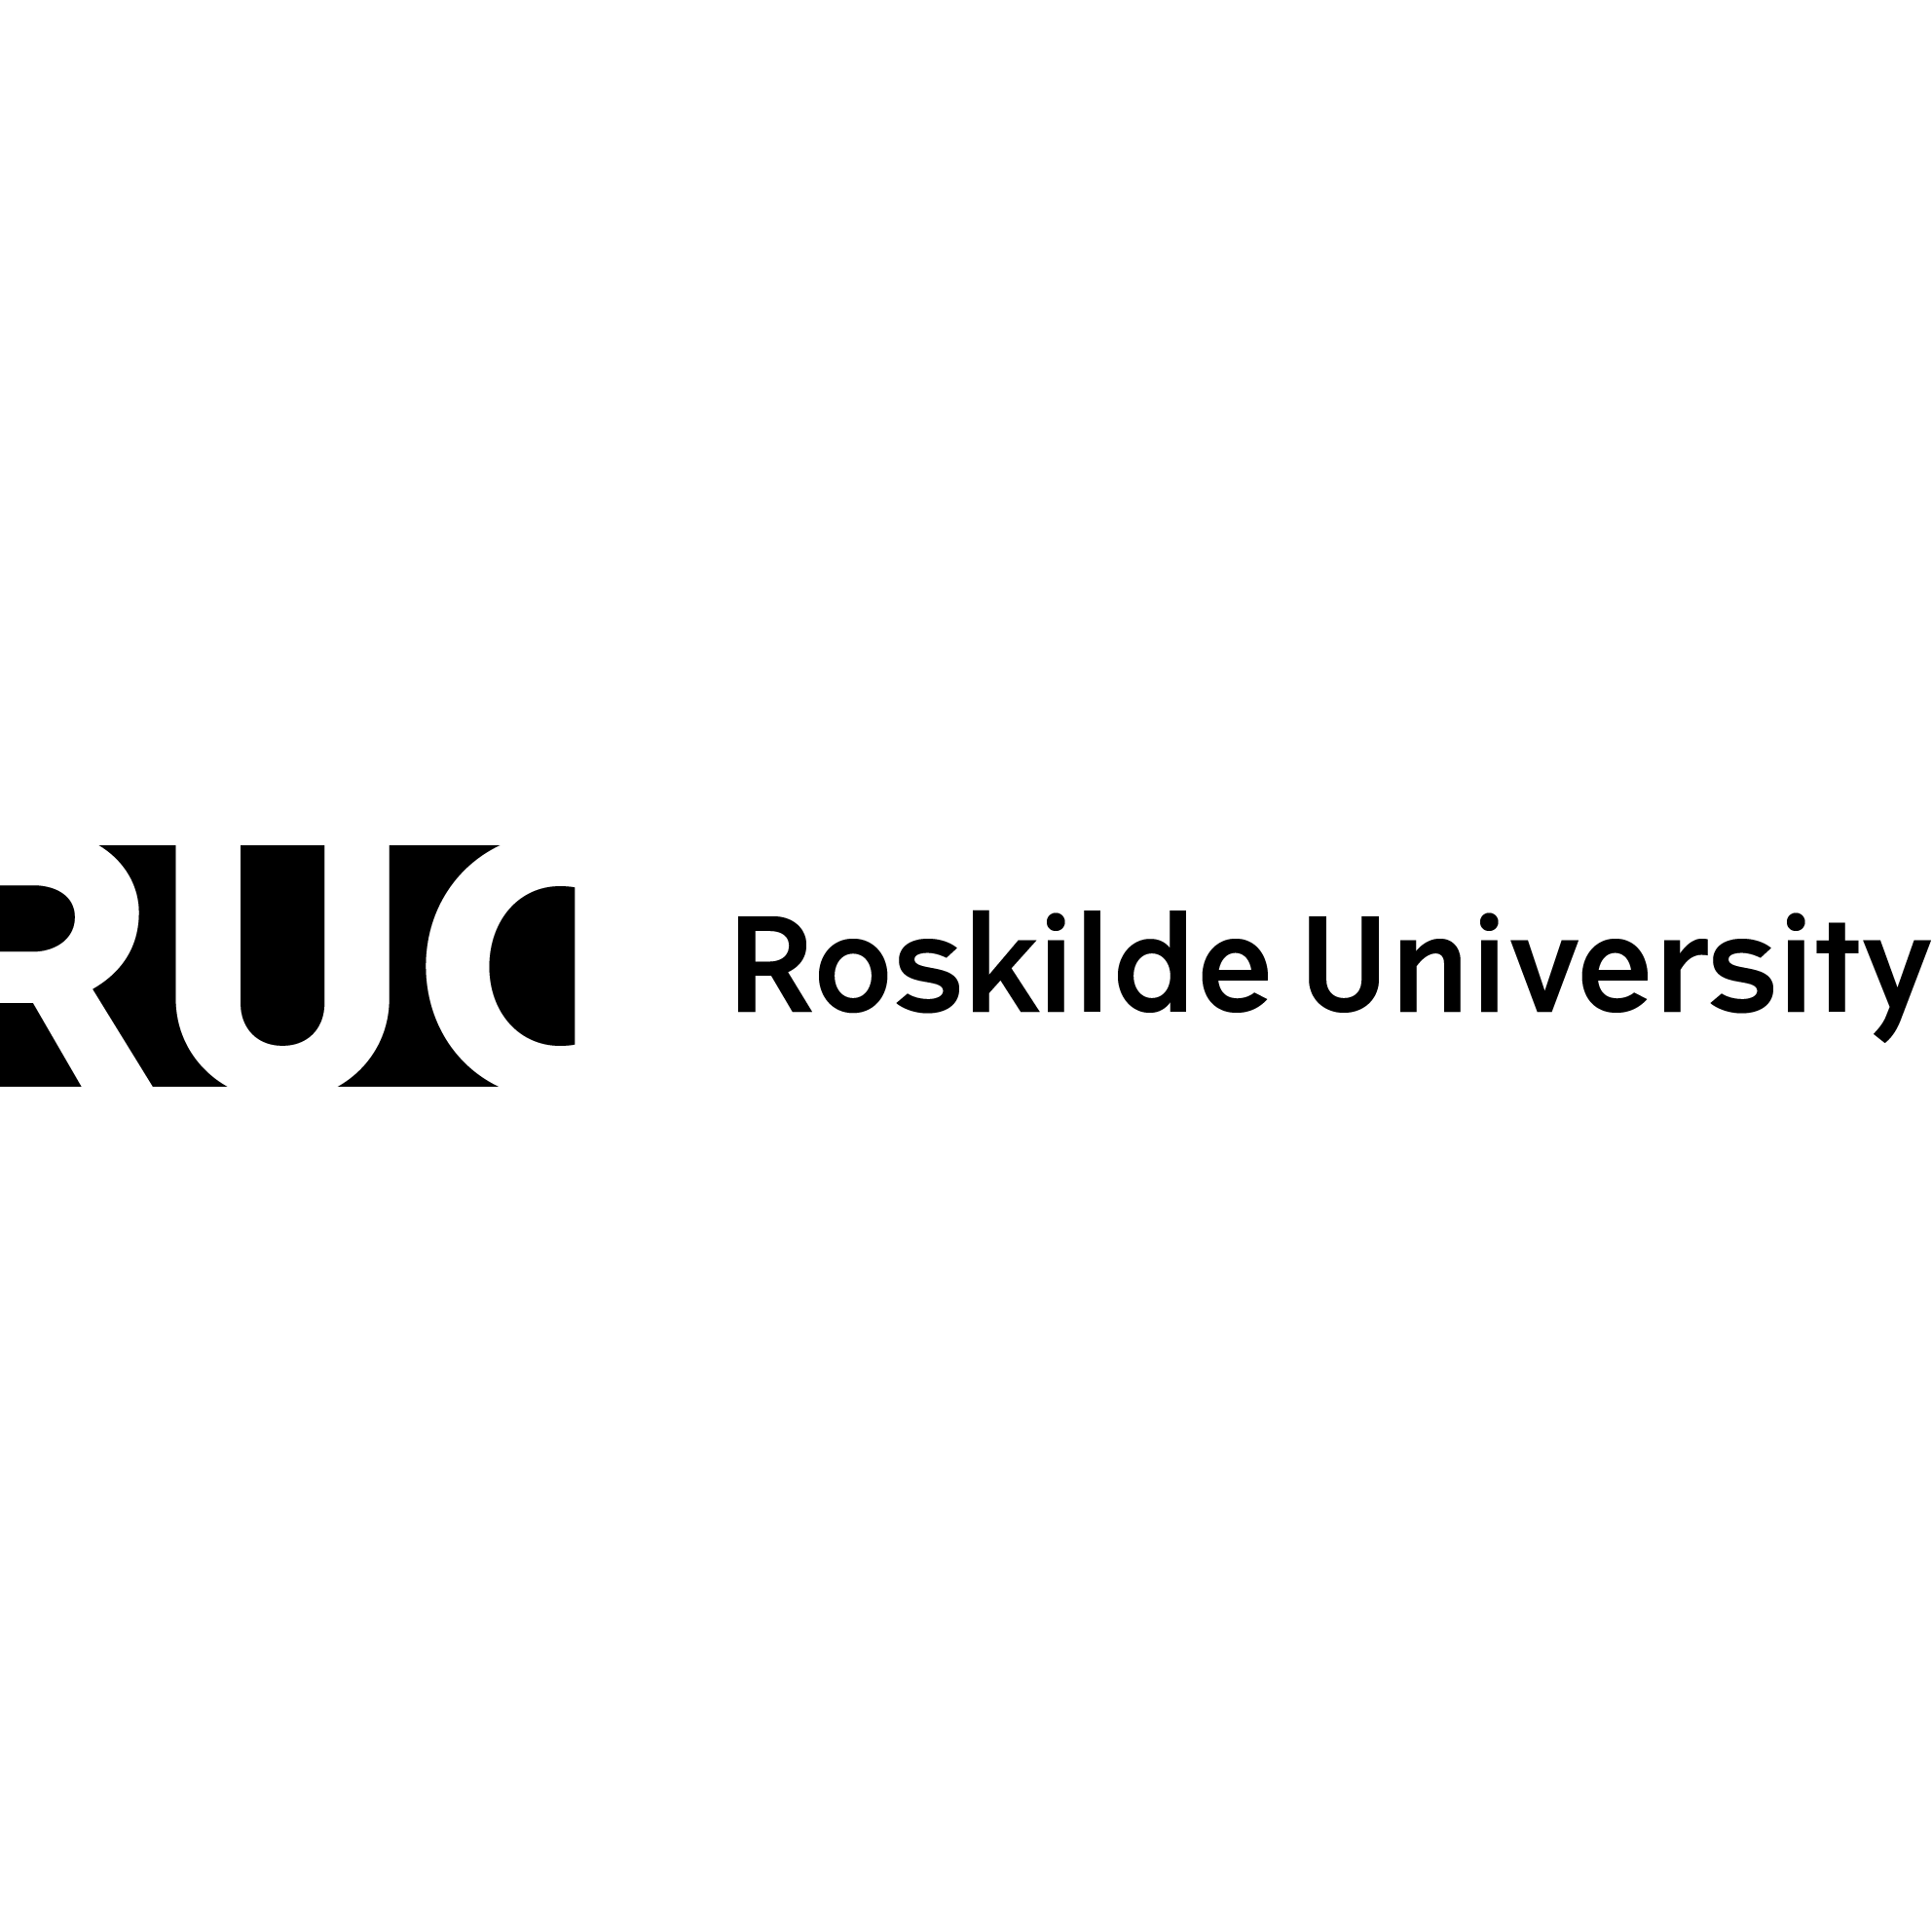 EXTF_20200601_RUC_ROSKILDE_UNIVERSITY_BLACK_CMYK_logo_Square